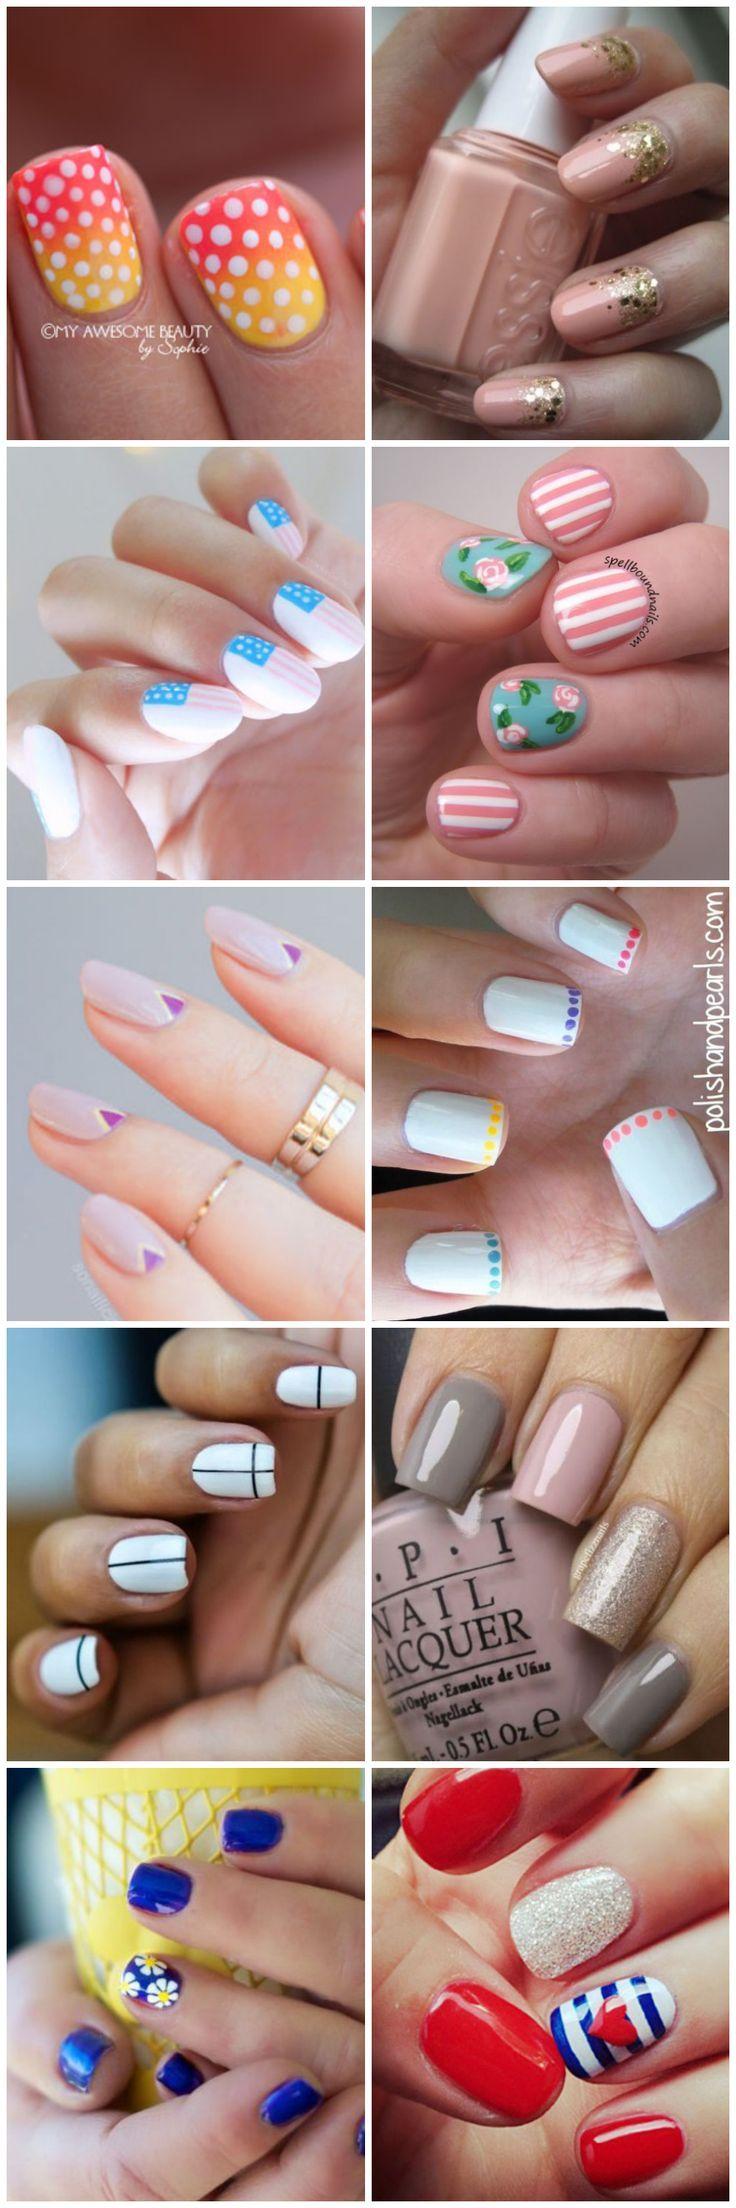 30 Easy Nail Art for Beginners | #uñas | Pinterest | Easy nail art ...